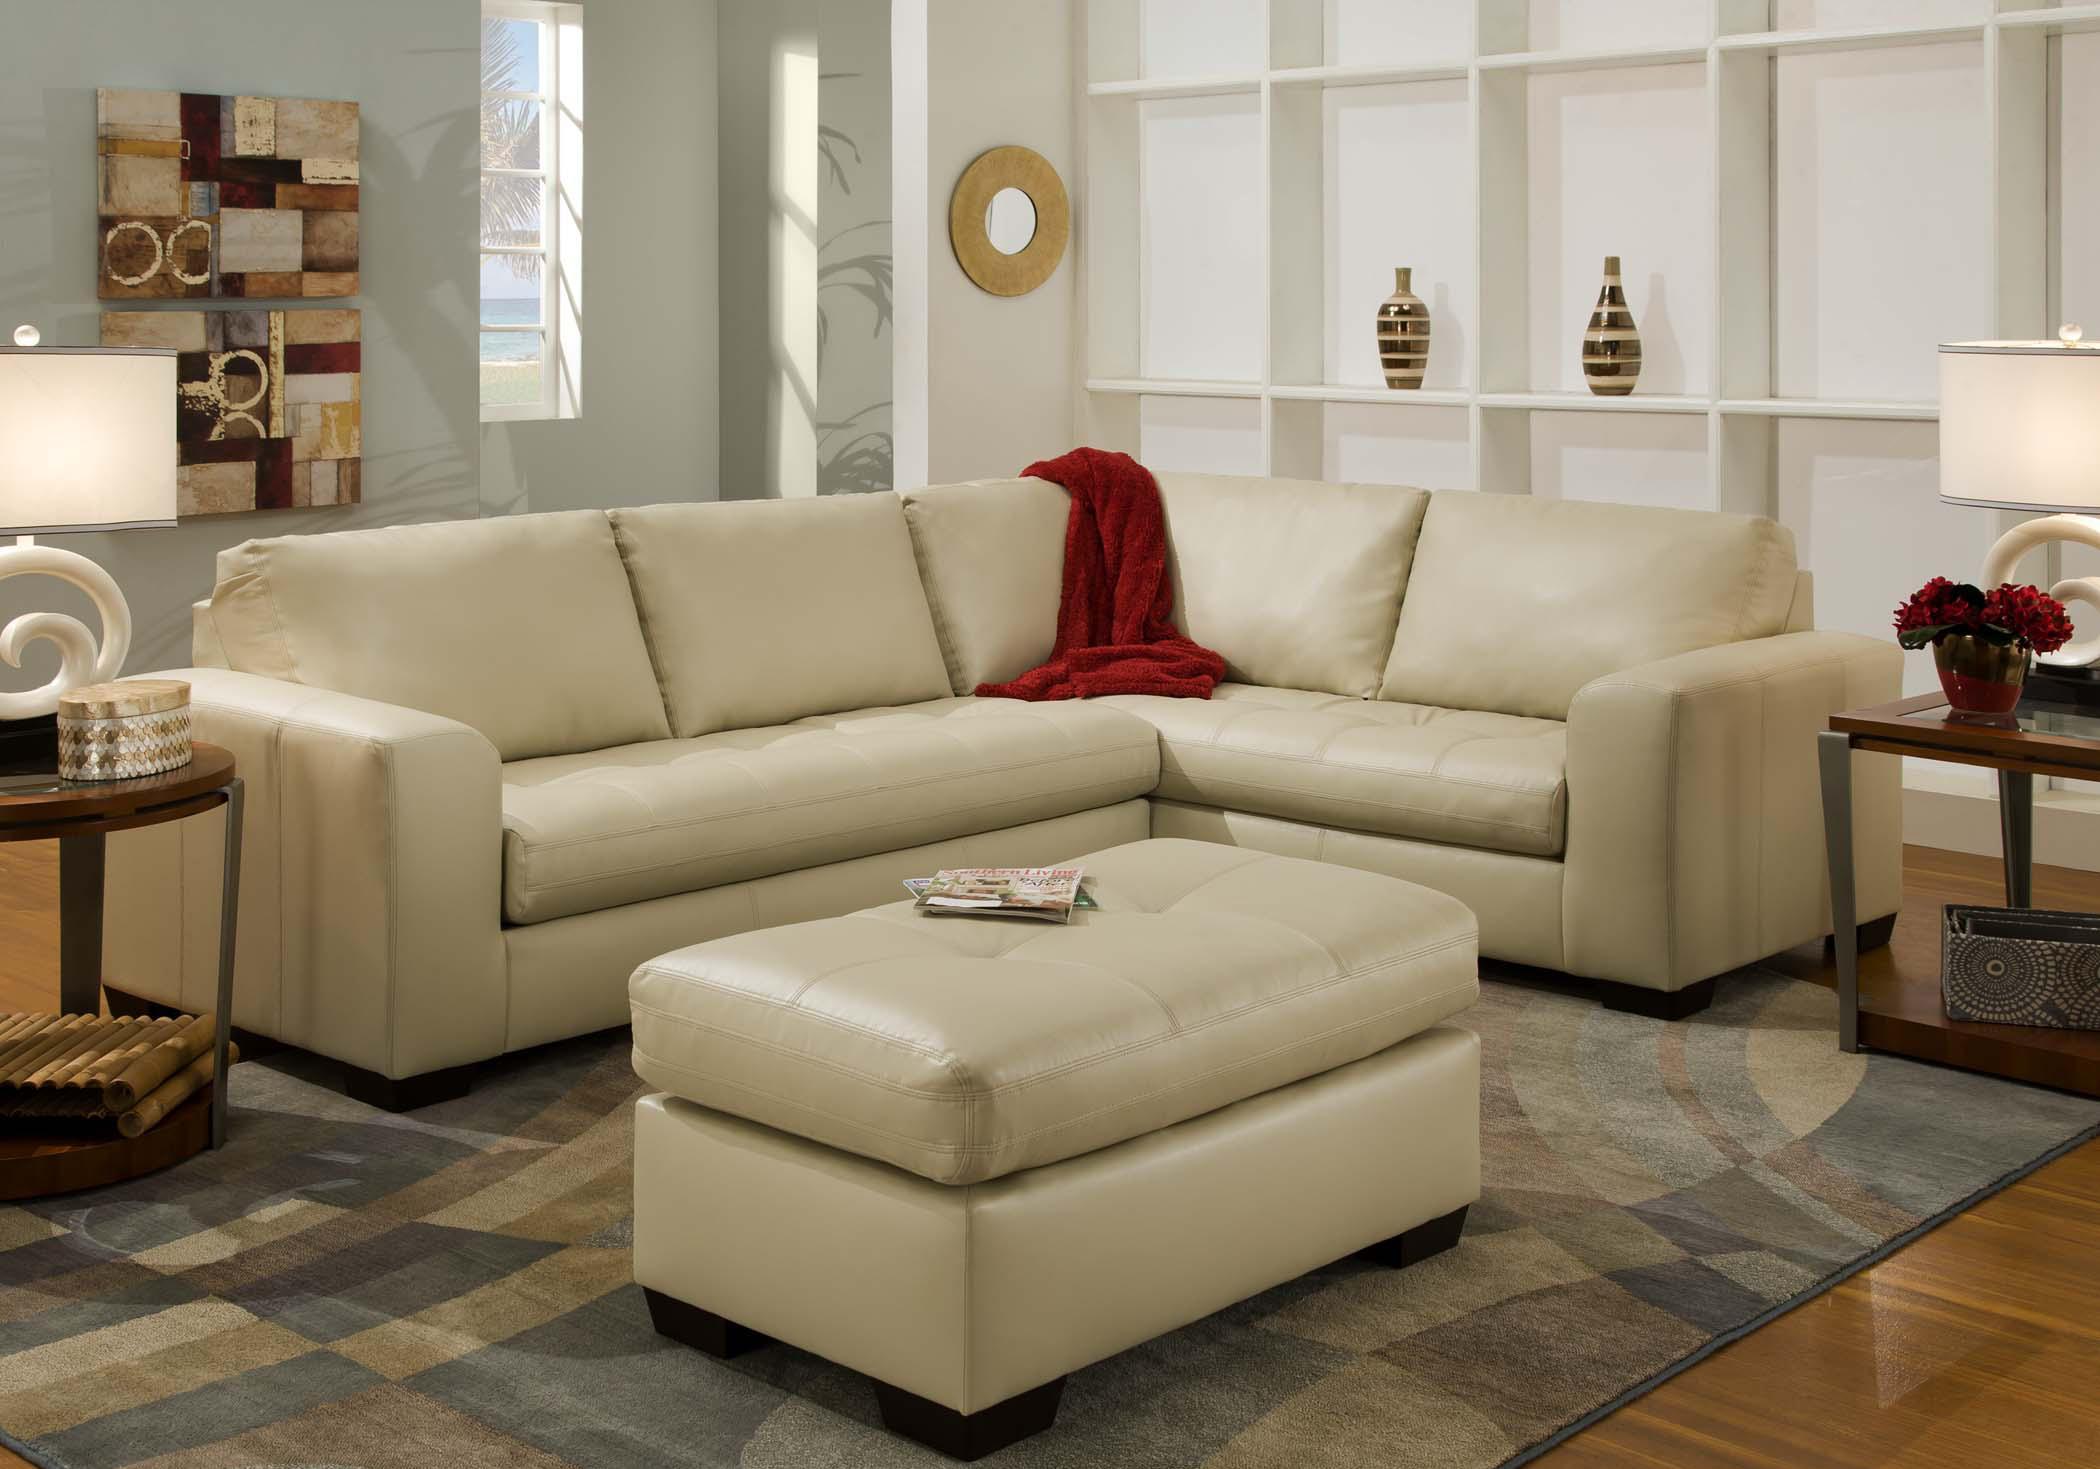 American Furniture 1230 Stationary Living Room Group - Item Number: 1230 Living Room Group 1 (Bone)